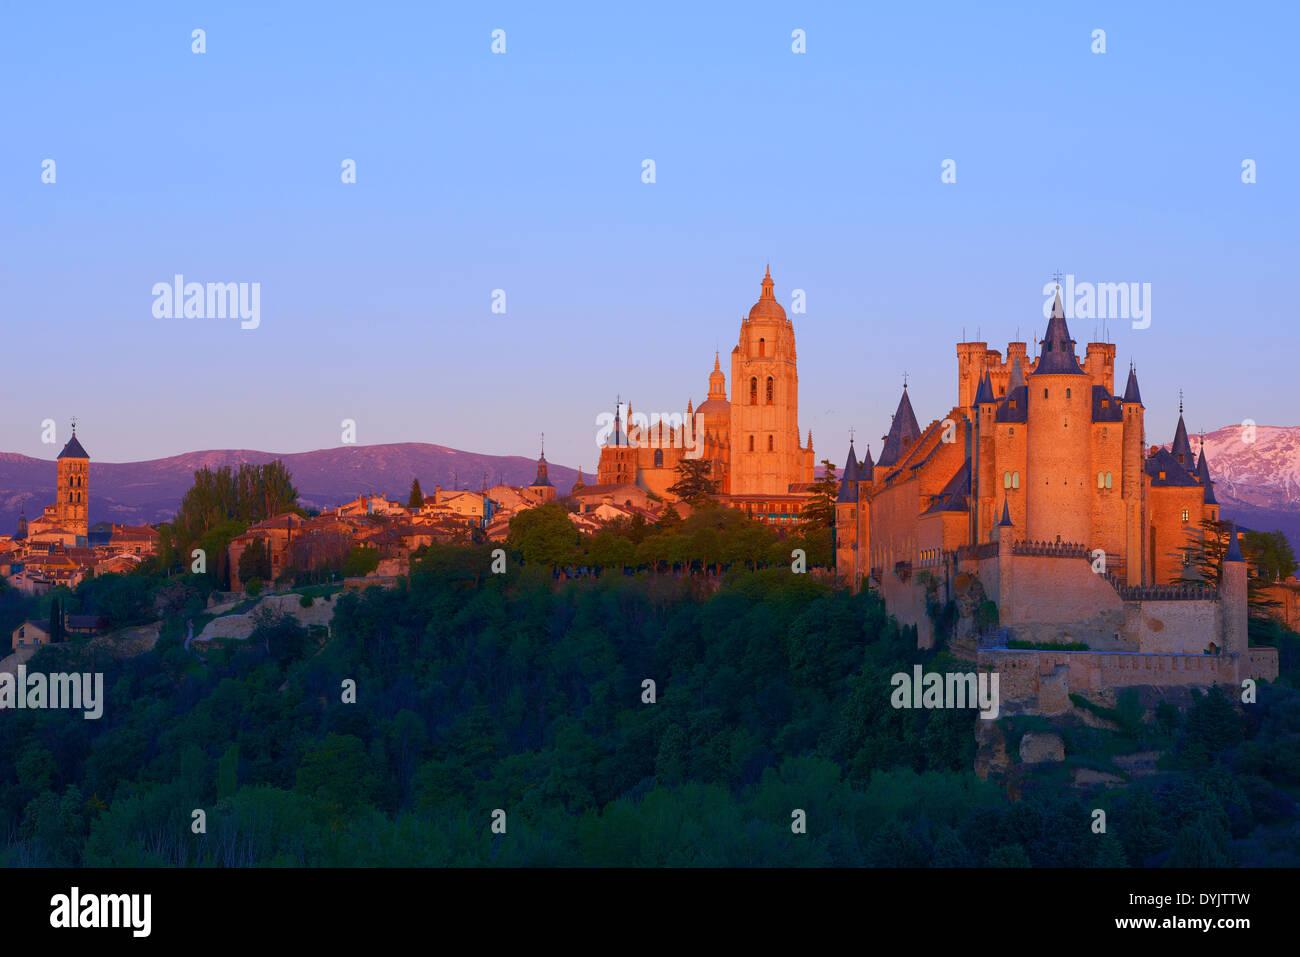 Alcazar, Cathedral, Segovia, Alcazar fortress and Cathedral at Sunset, Castilla-León, Spain. Alcazar von Segovia ist eine Burg i Stock Photo